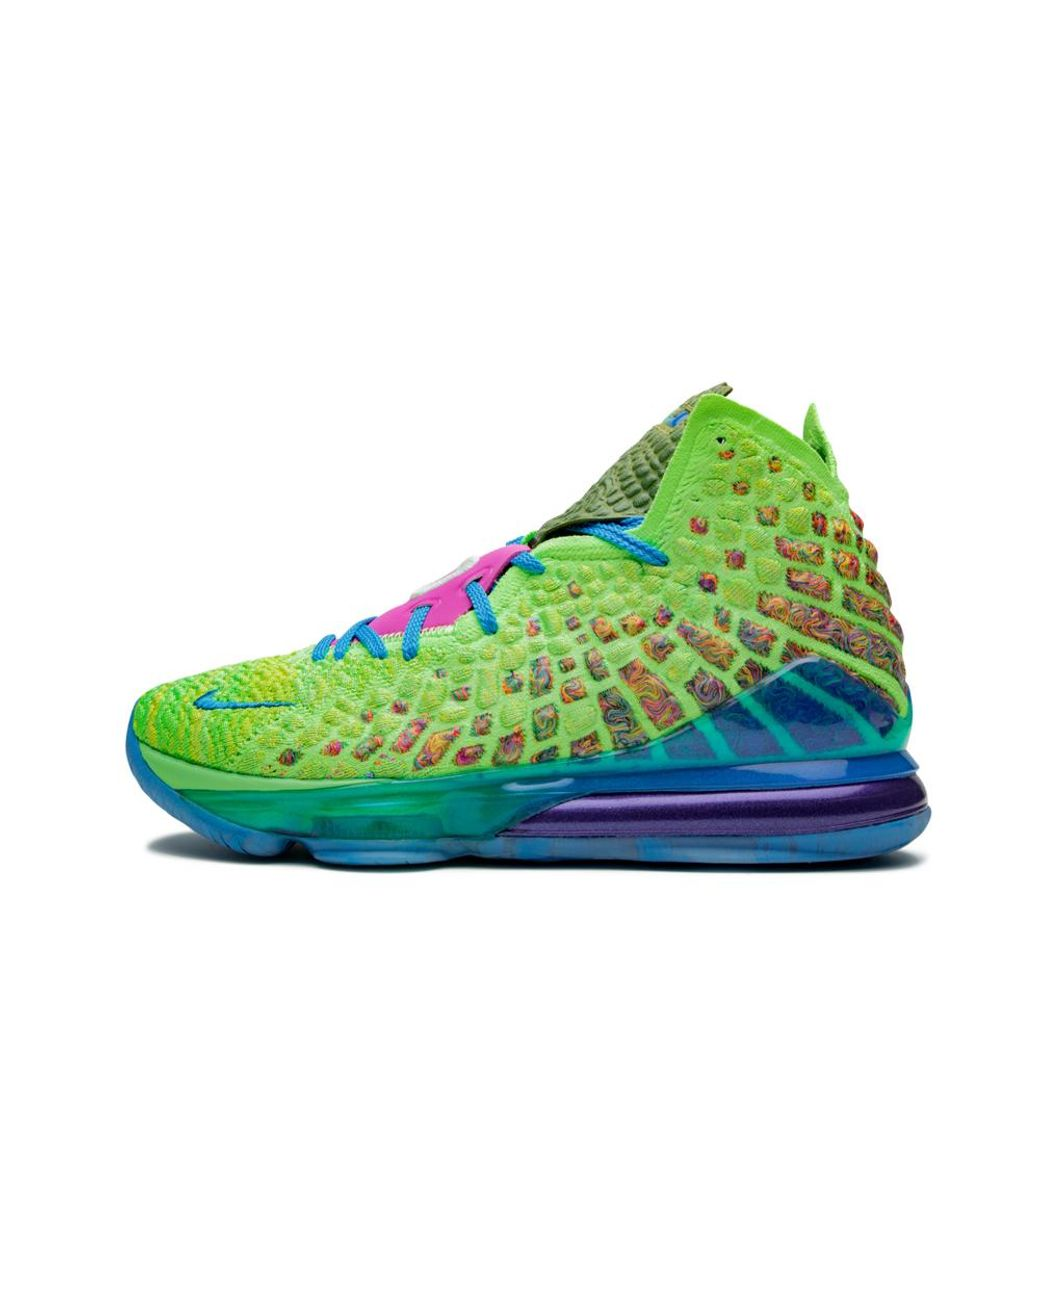 Nike Lebron 17 All Star Promo 'mr